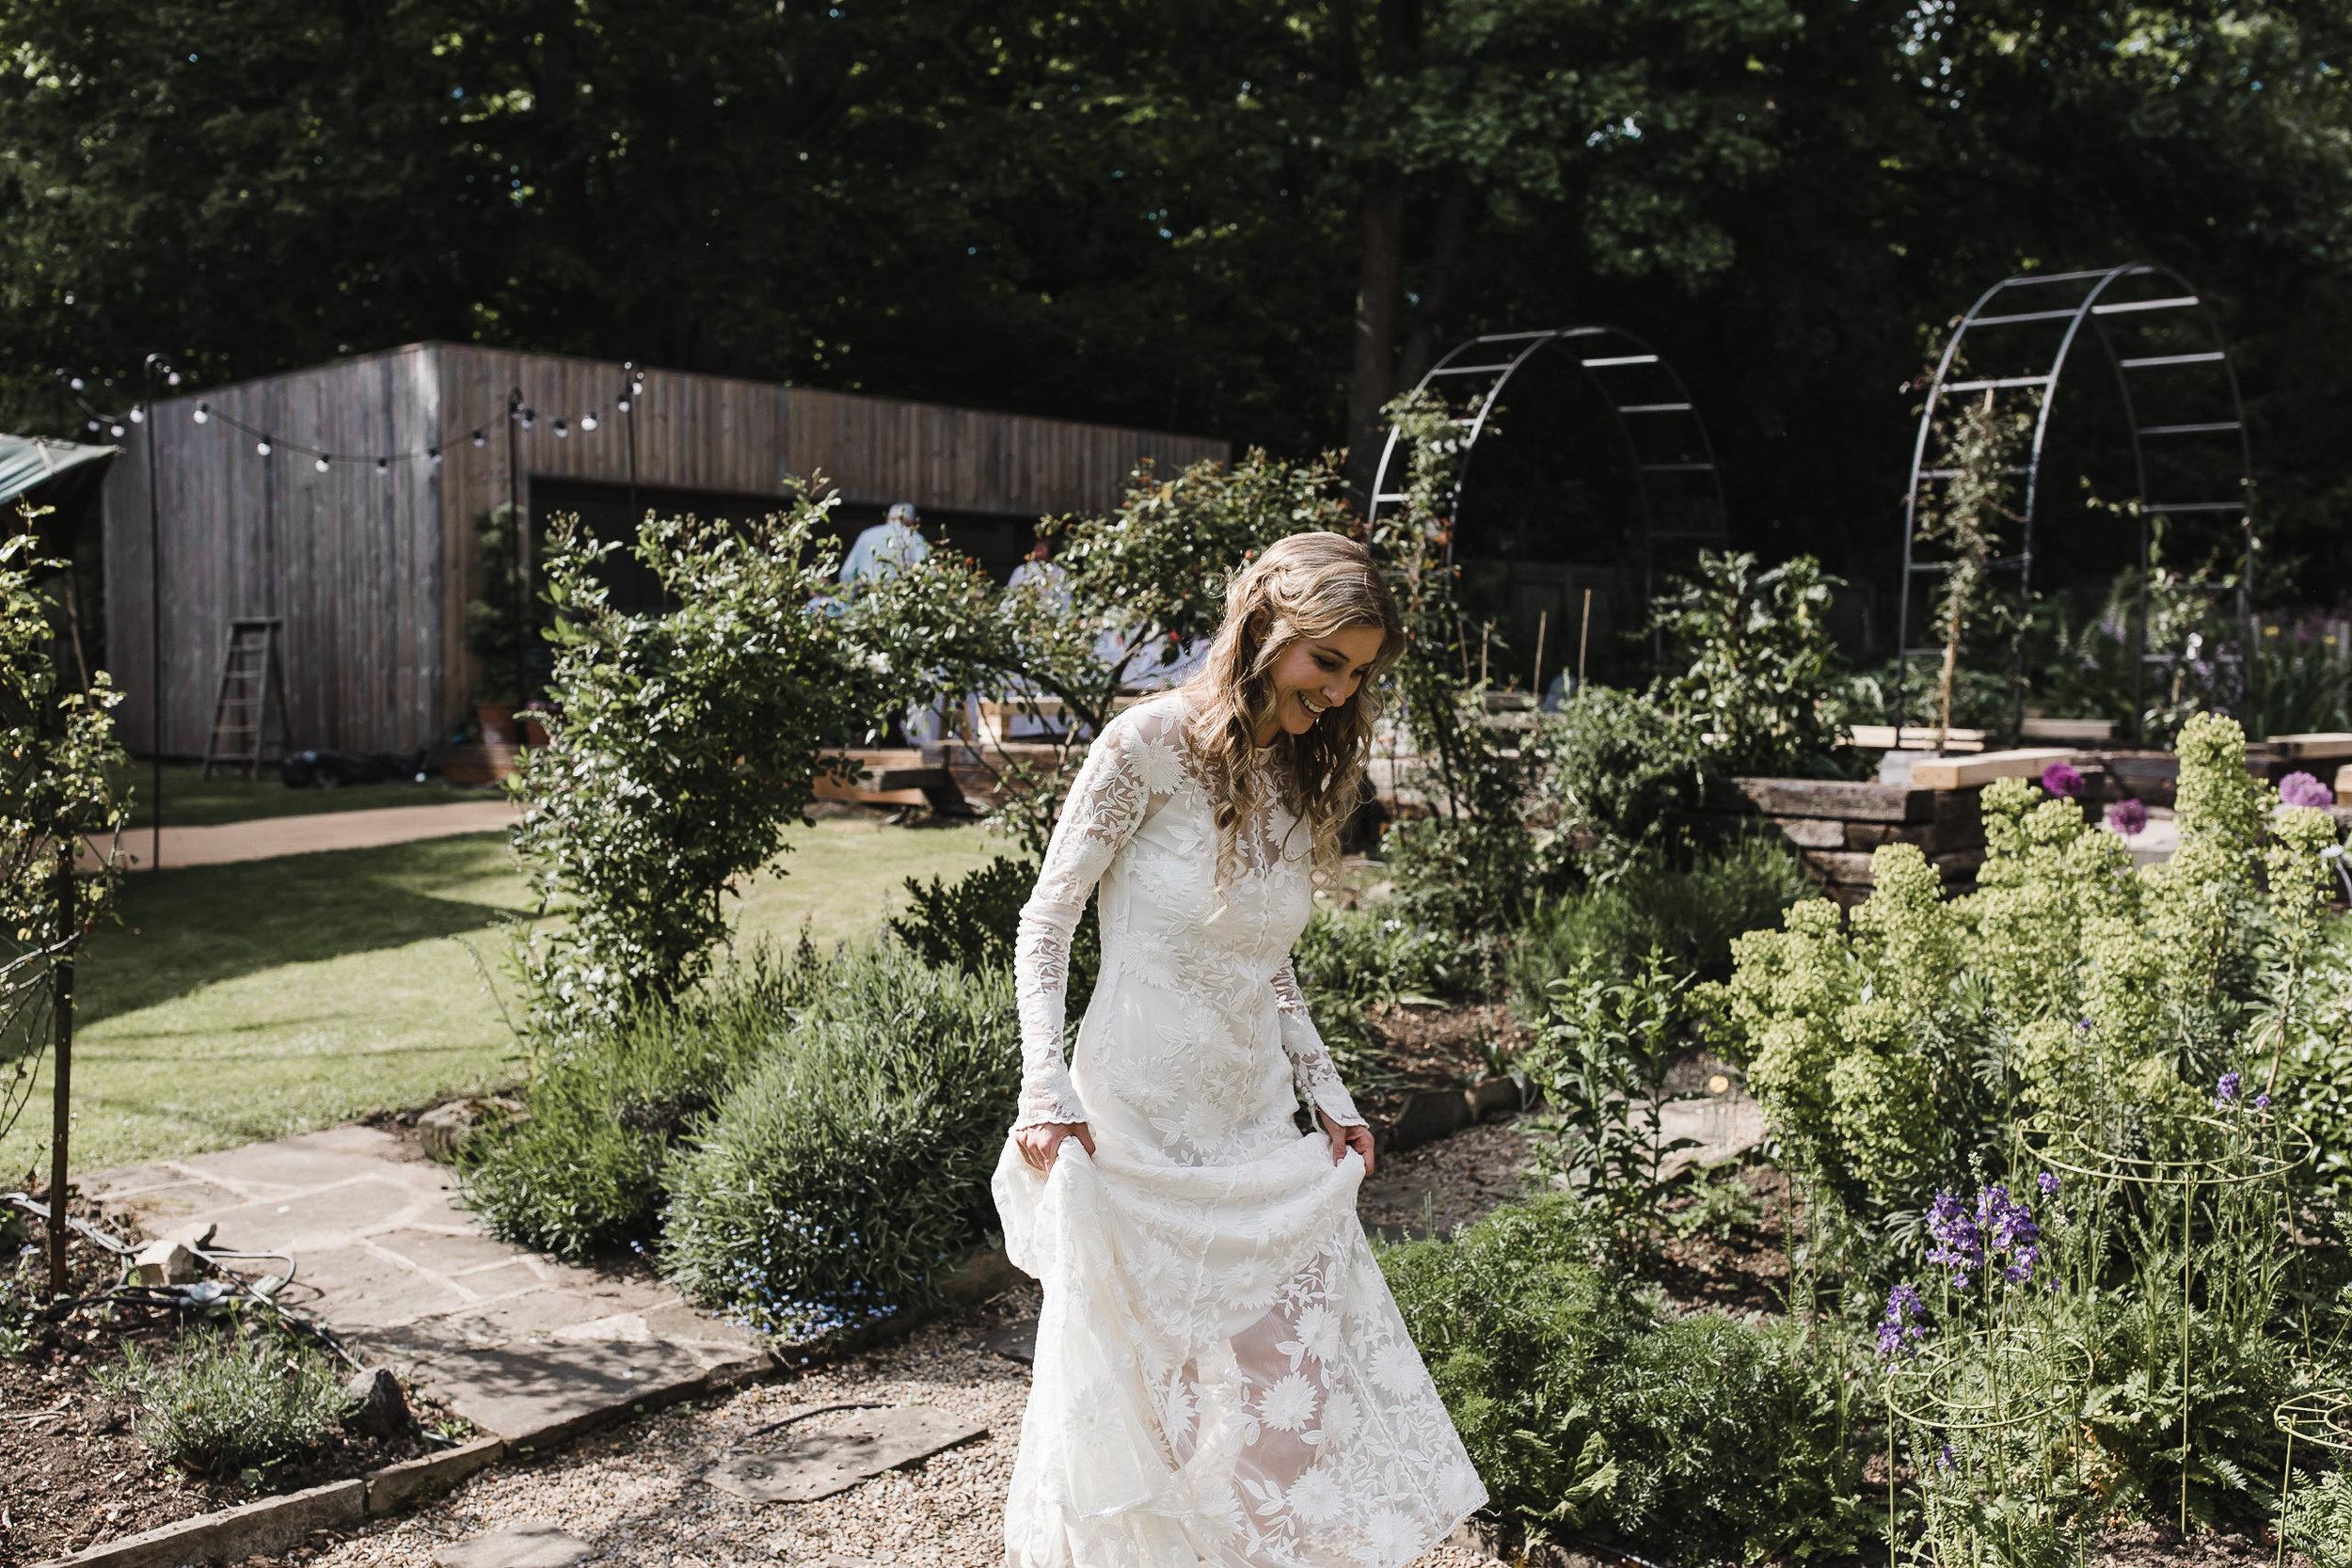 Roundhay-Leeds-Backyard-Wedding-Becs-Chris-146.jpg